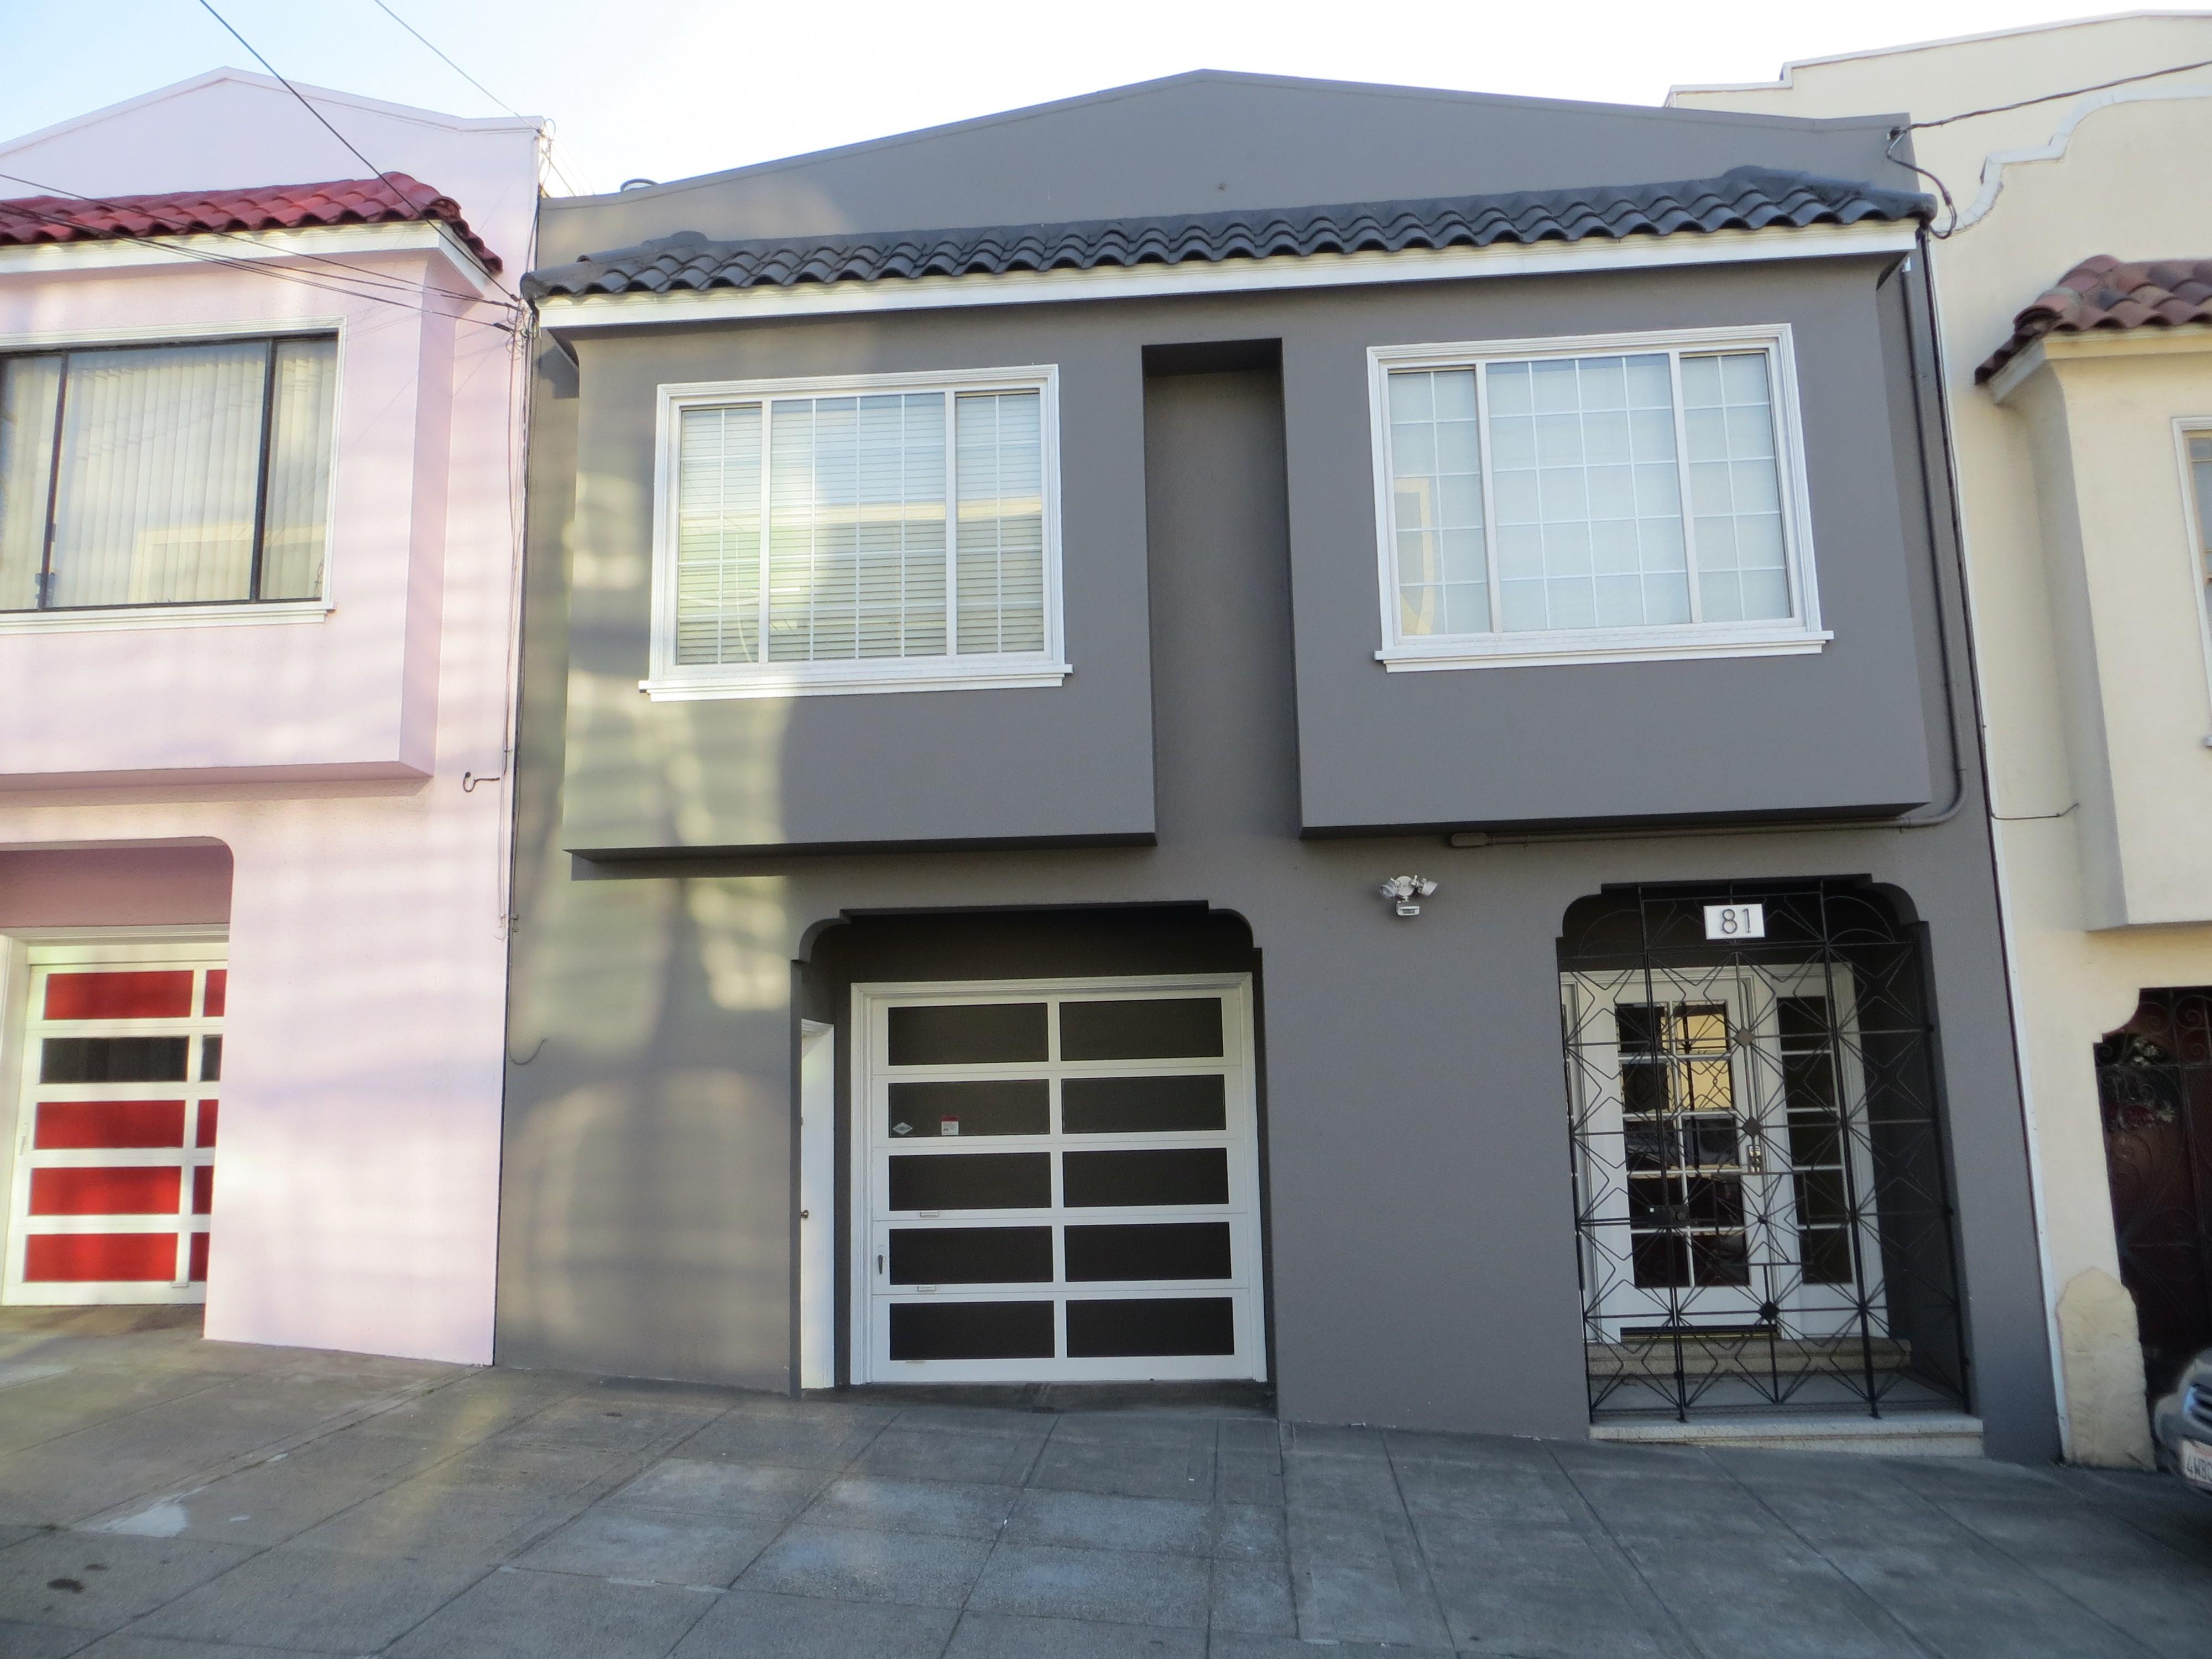 81 Santa Rosa Avenue San Francisco Ca 94112 3 Bedroom House For Rent For 4 300 Month Zumper